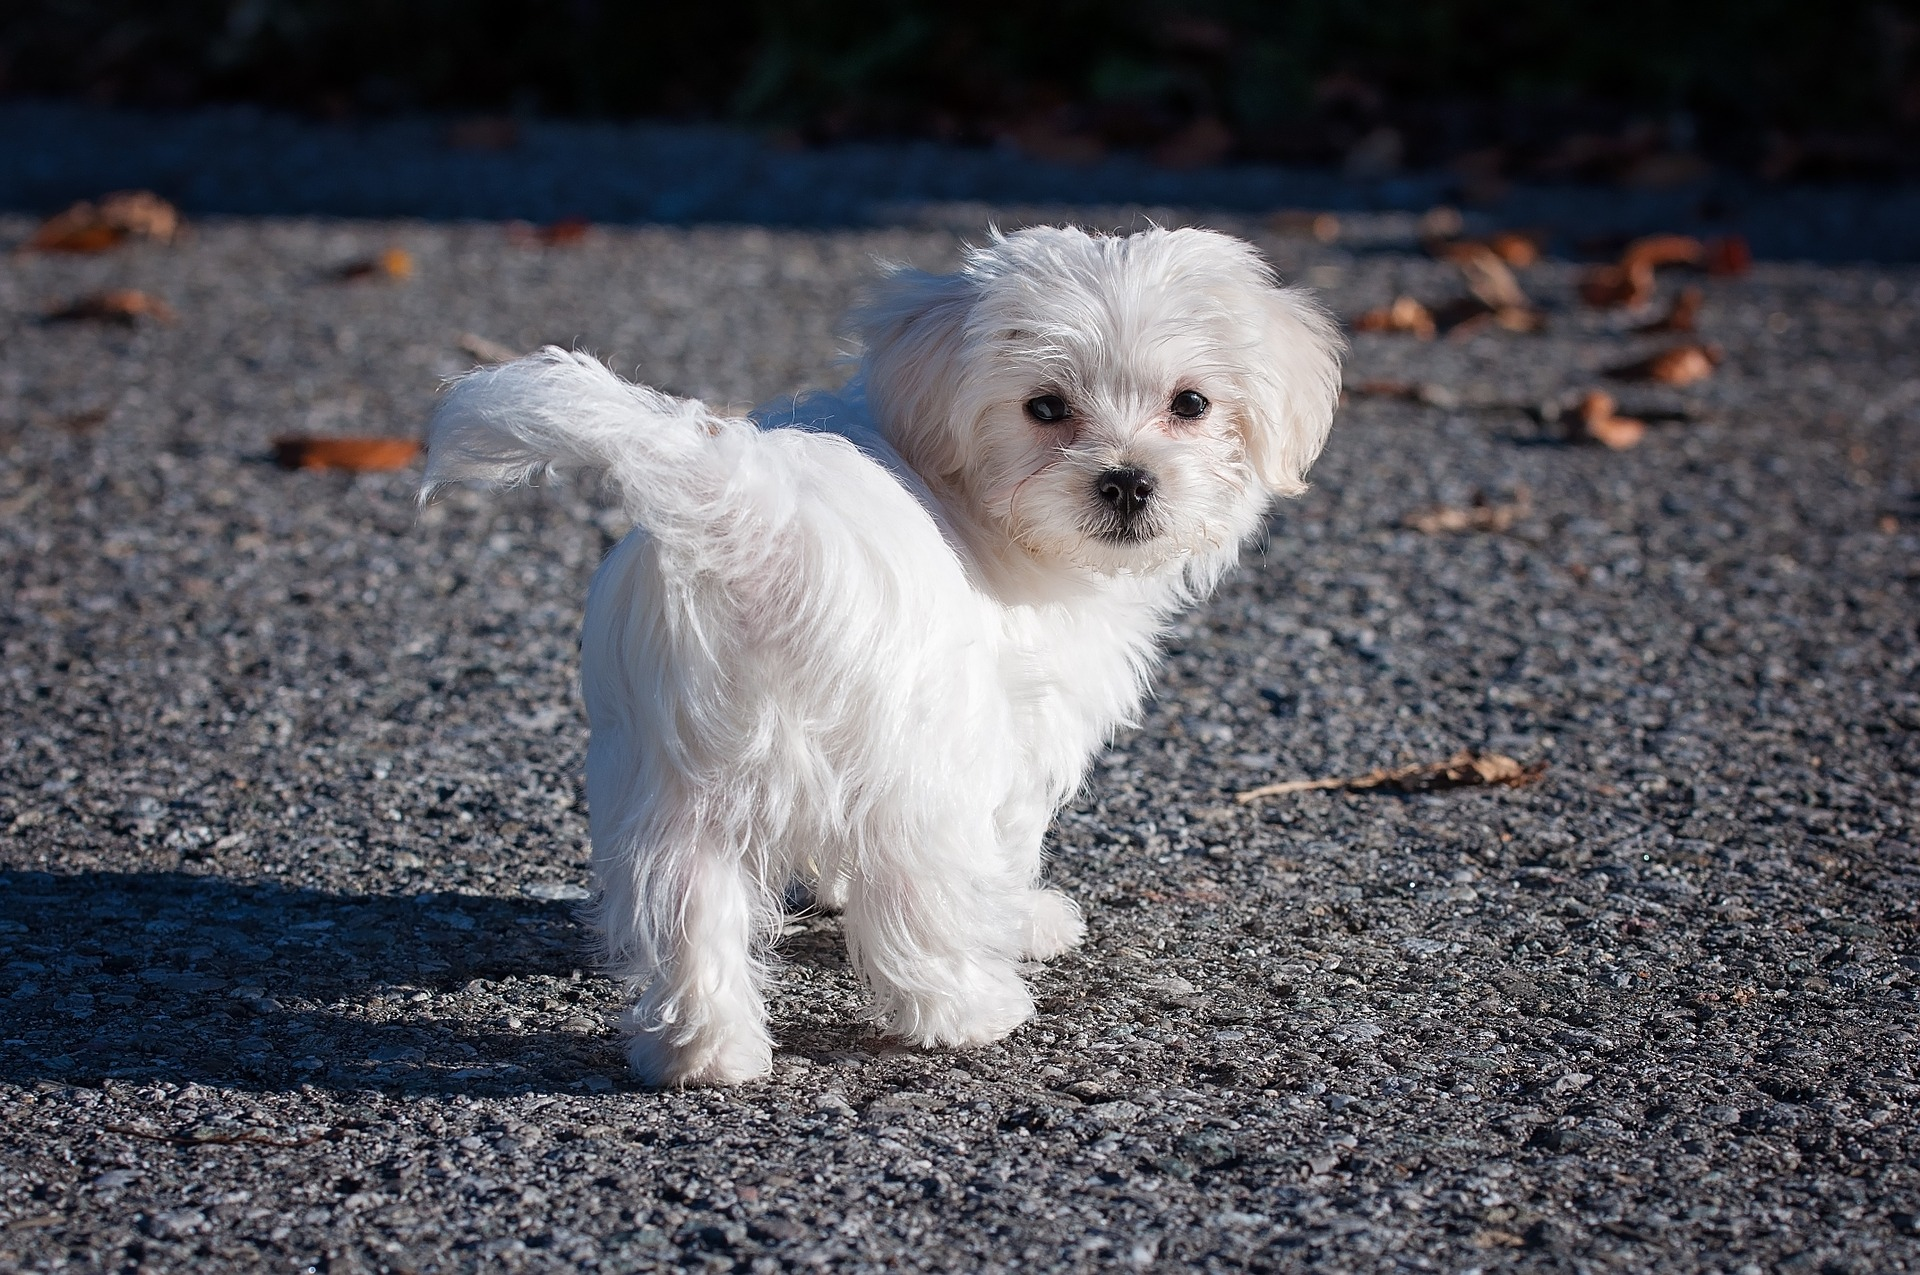 Wit hondenras - Malthezer